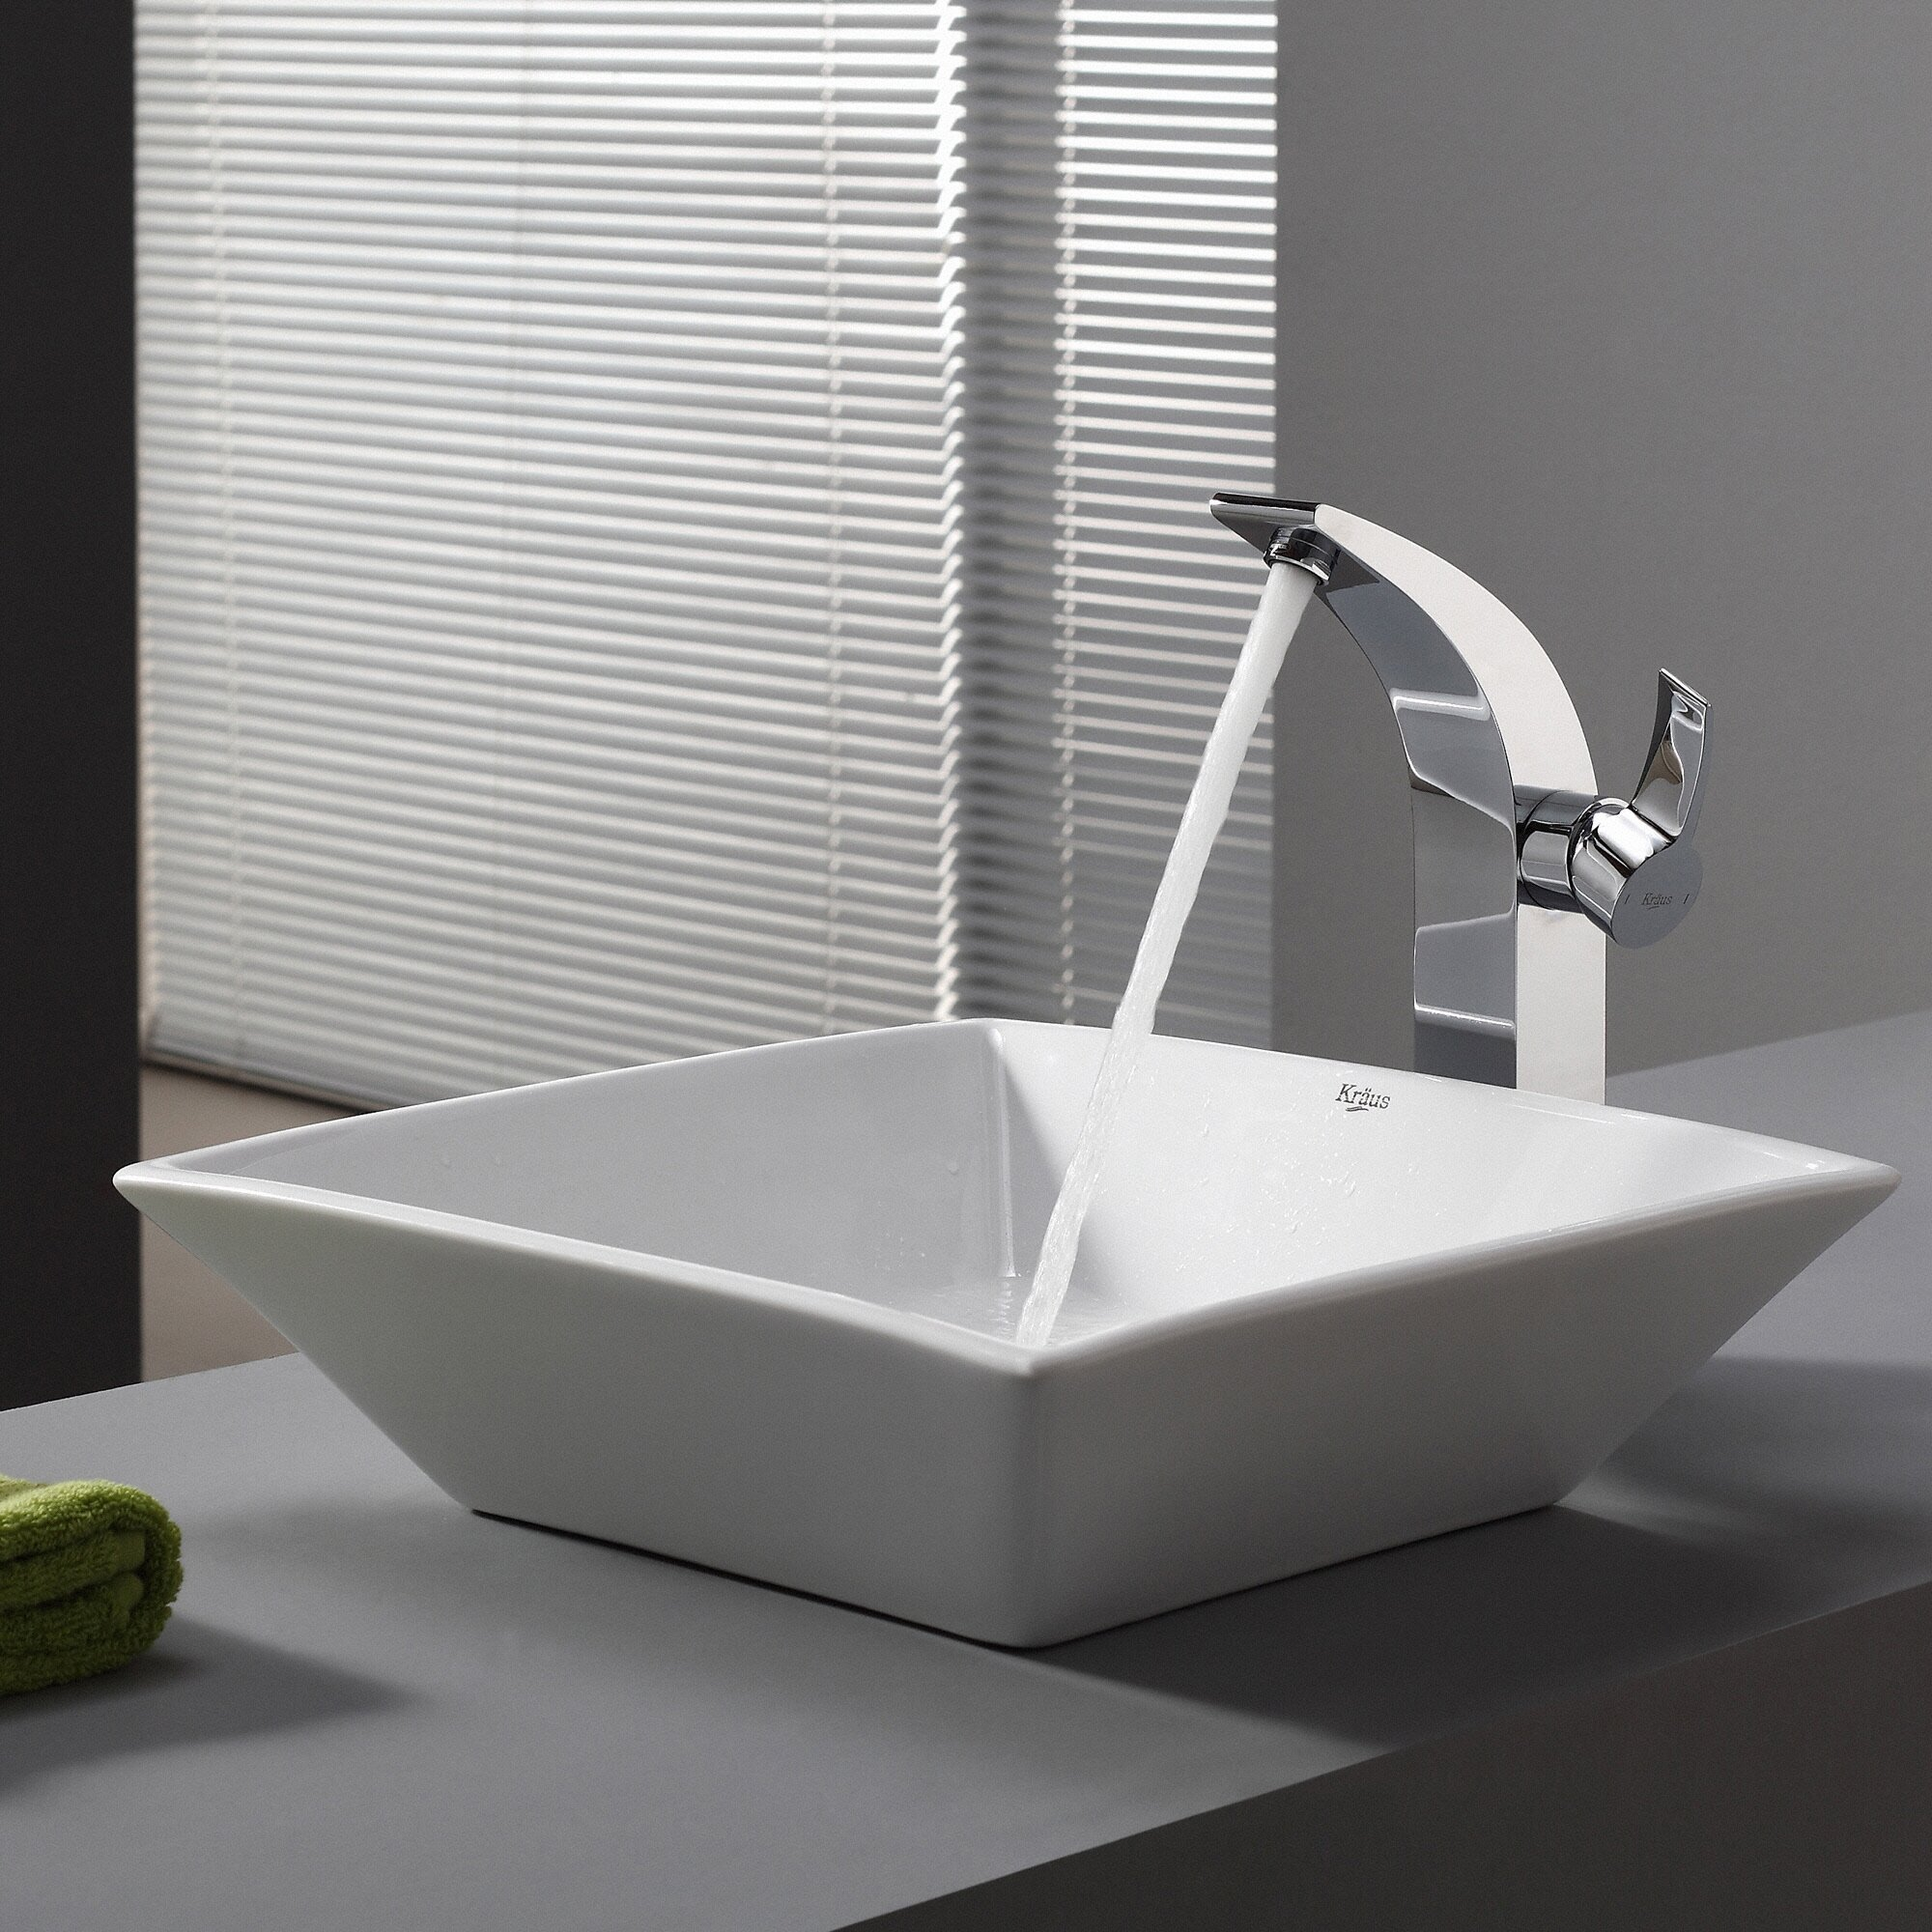 Kraus Ceramic Square Vessel Bathroom Sink & Reviews